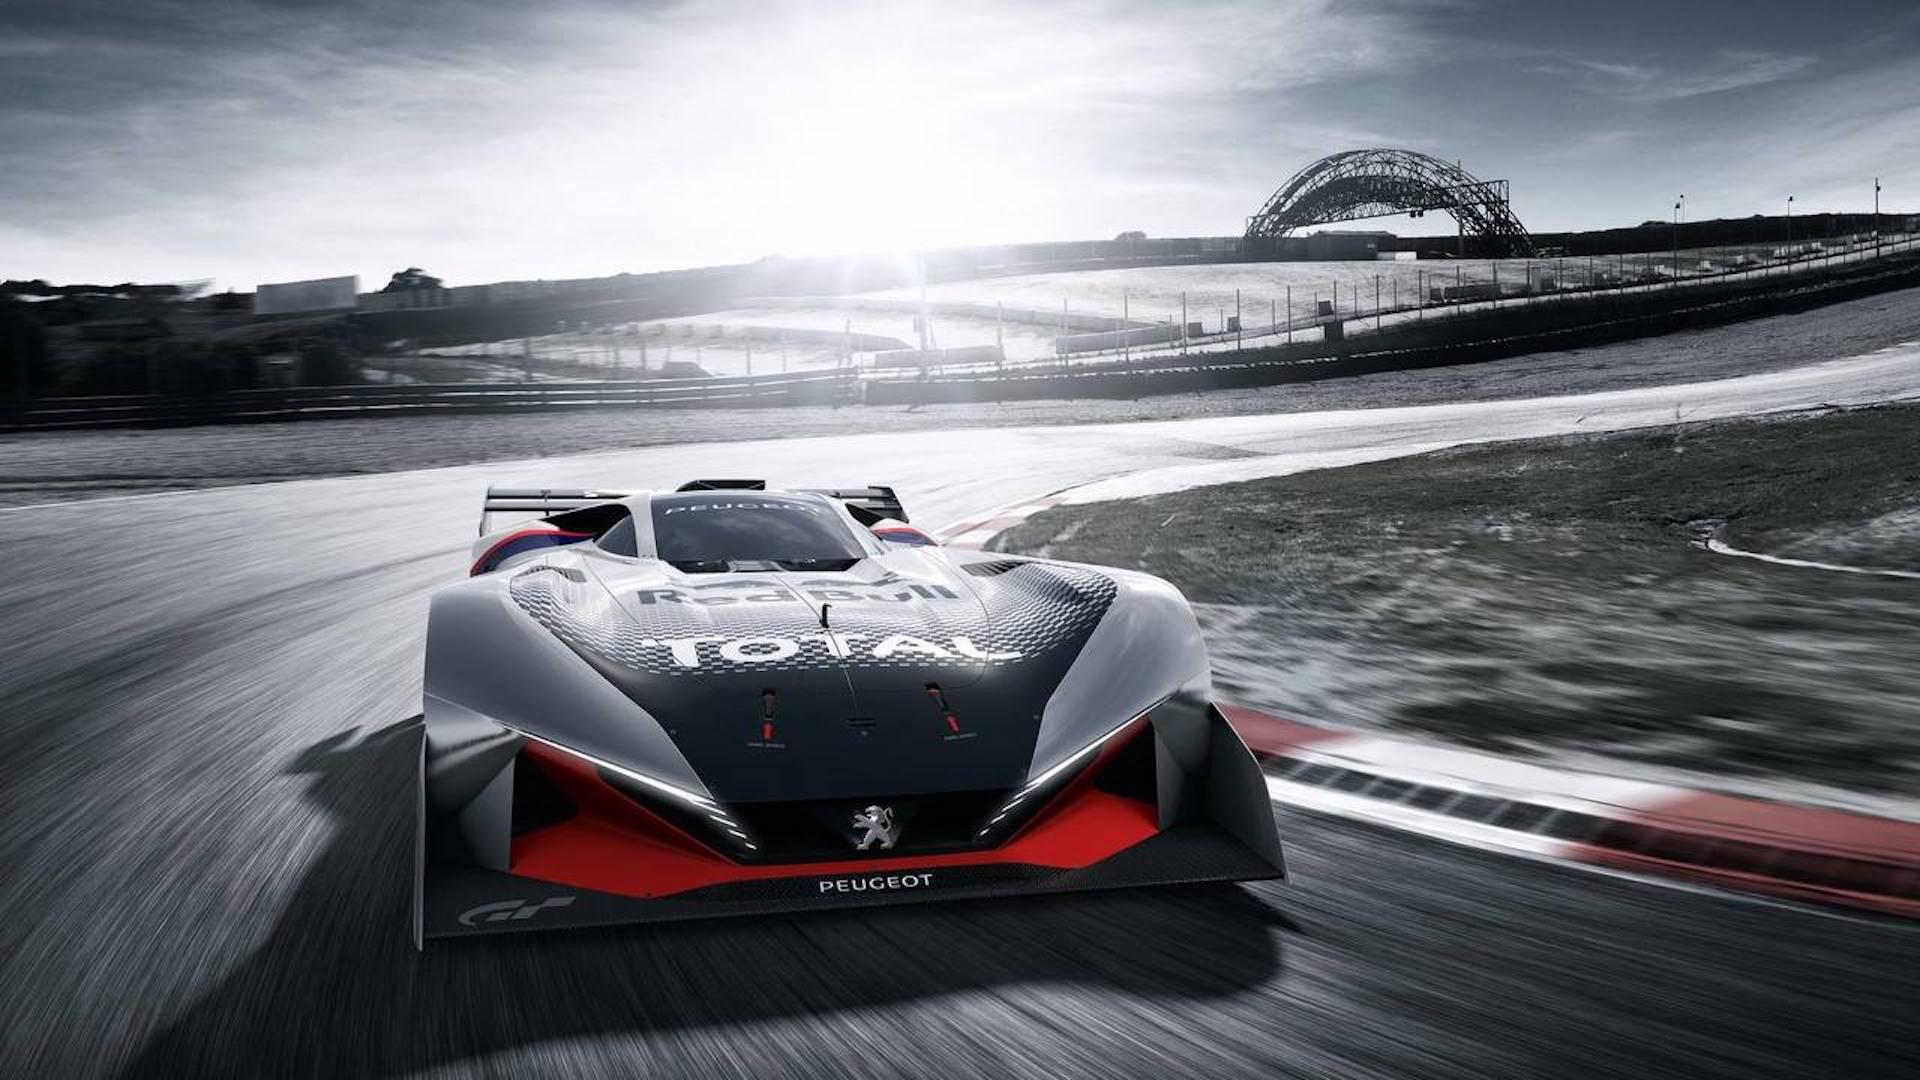 Peugeot L750 R Vision Gran Turismo concept